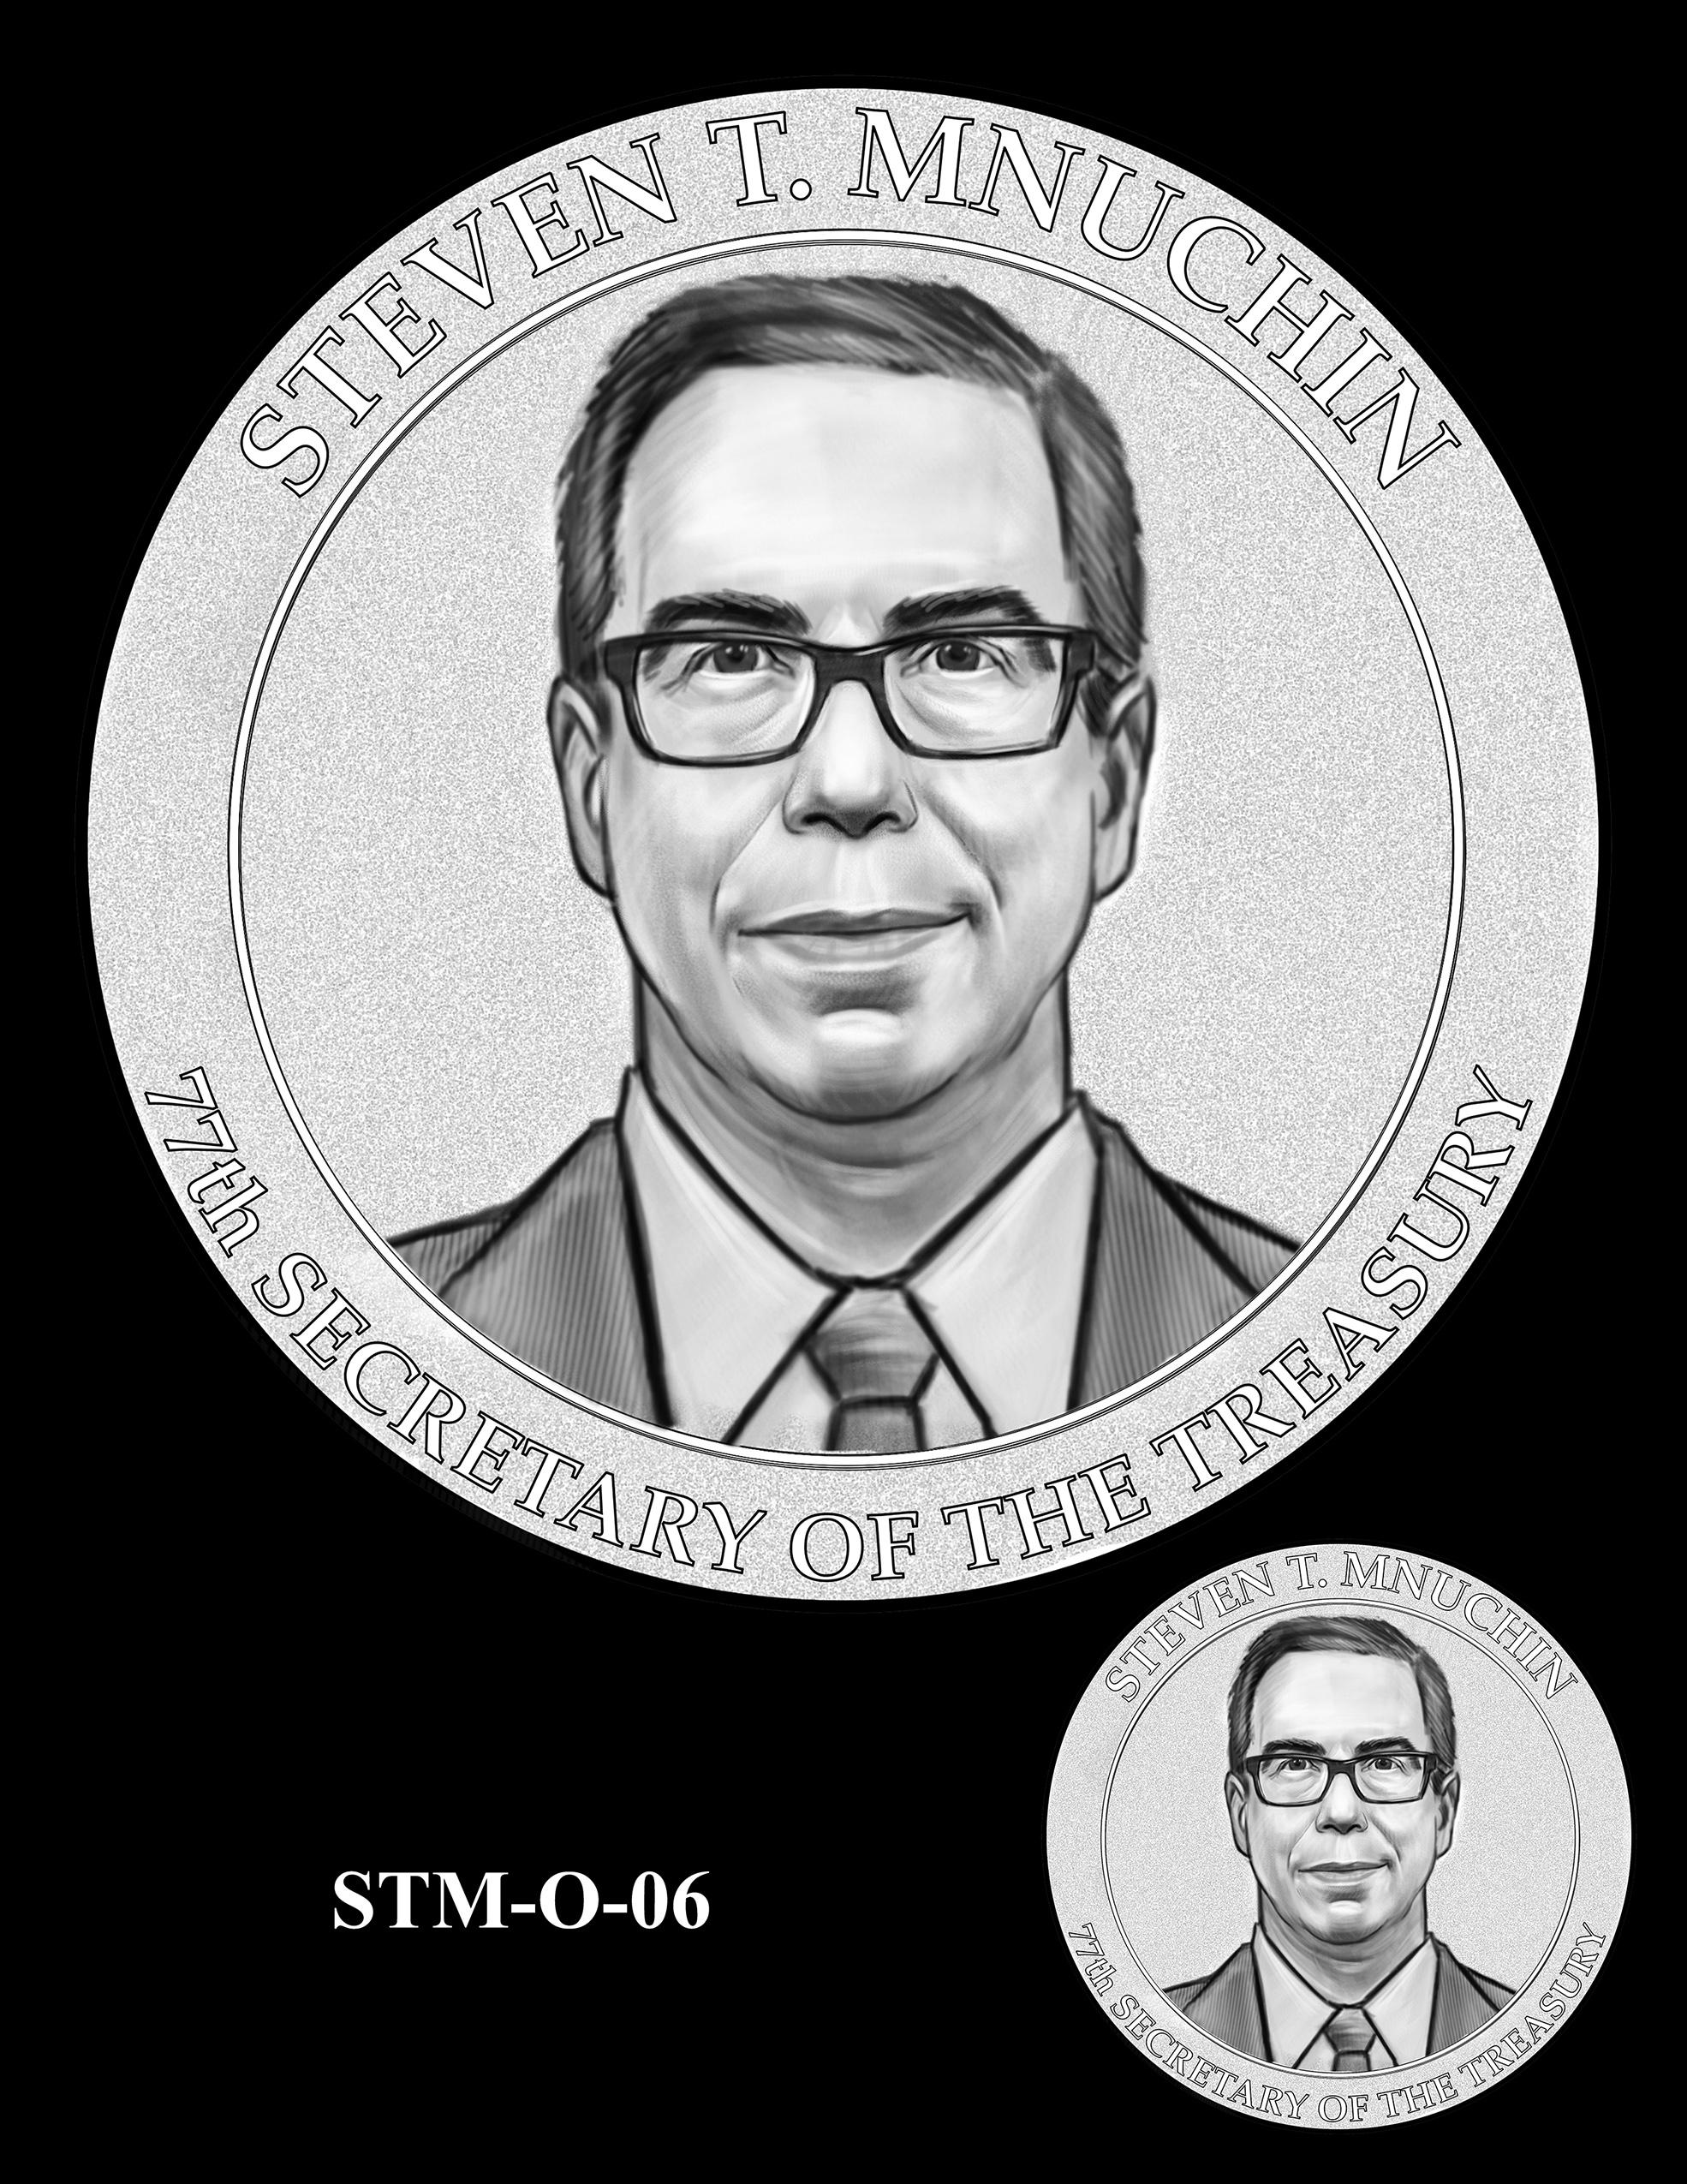 STM-O-06 -- Steven T. Mnuchin Secretary of the Treasury Medal